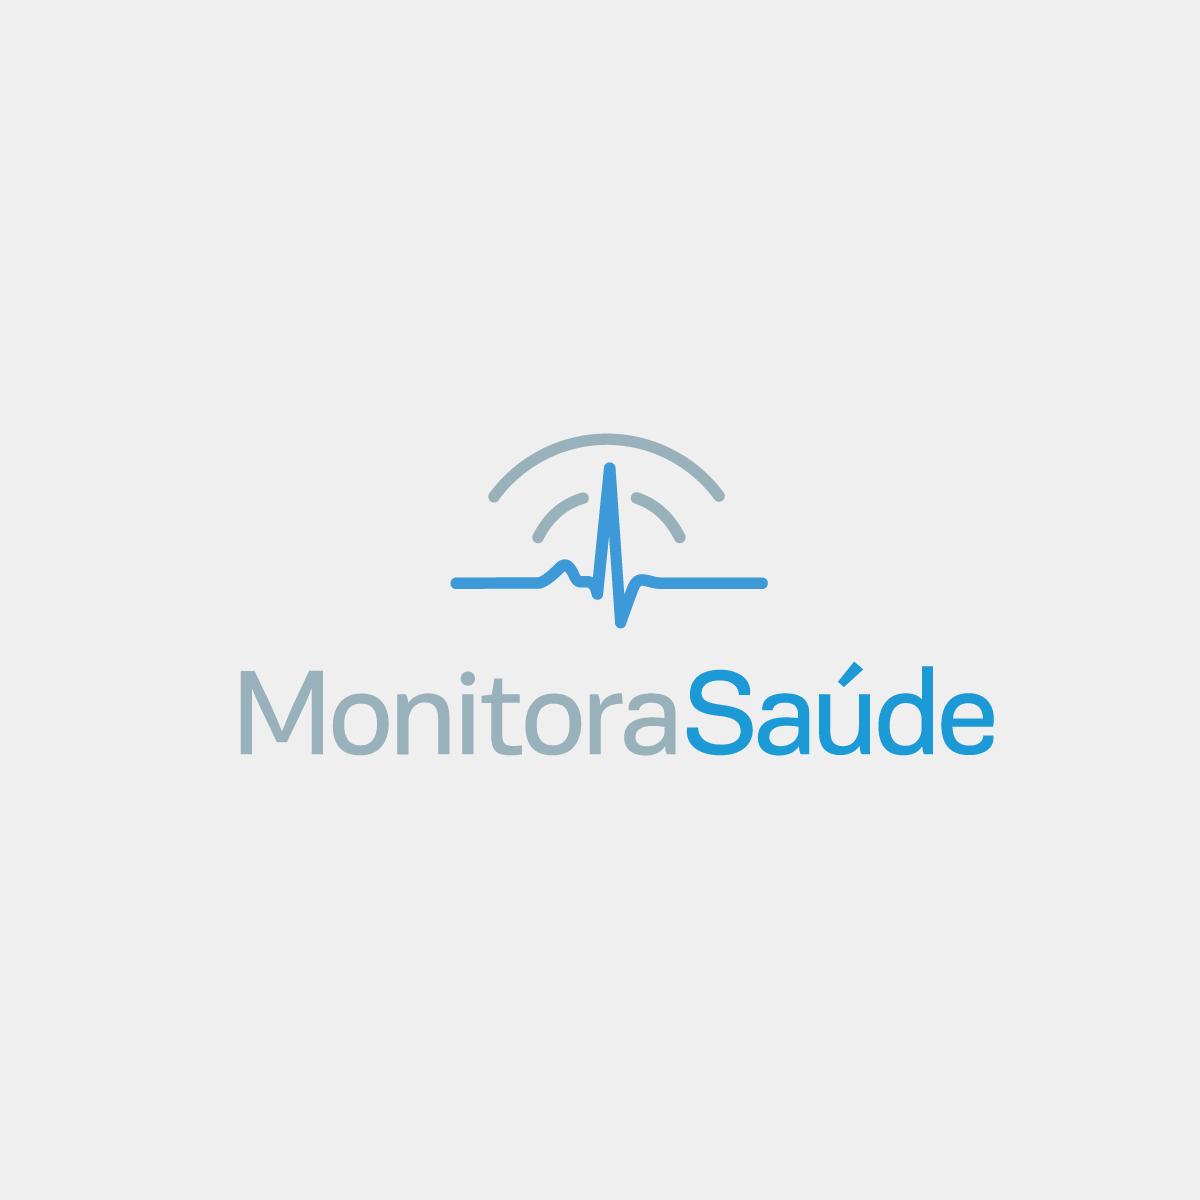 https://brasiltelemedicina.com.br/wp-content/uploads/2016/07/Produtos_MonitoraSaúde-1200x1200.png